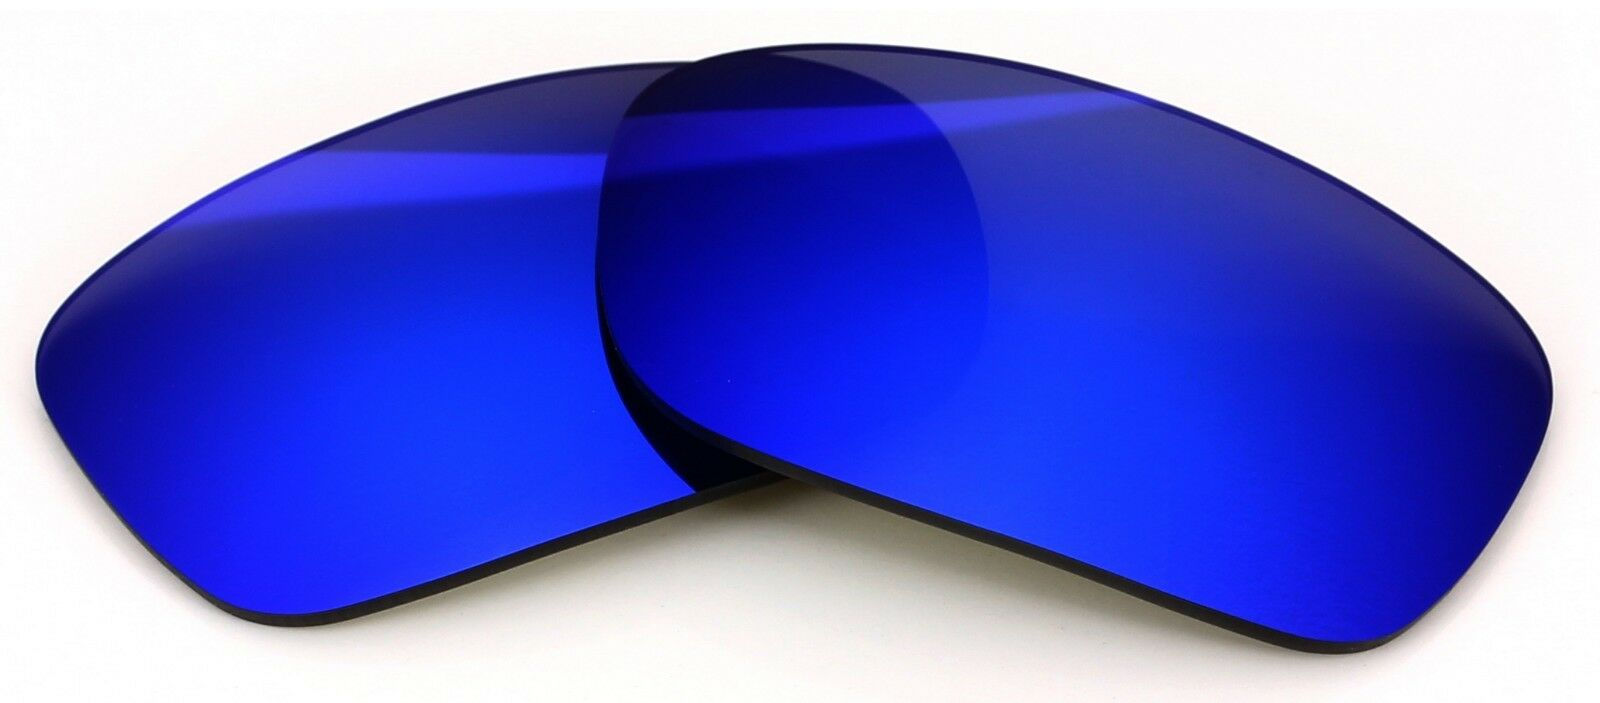 Polarized Ikon Iridium Replacement Lenses For Oakley Fives